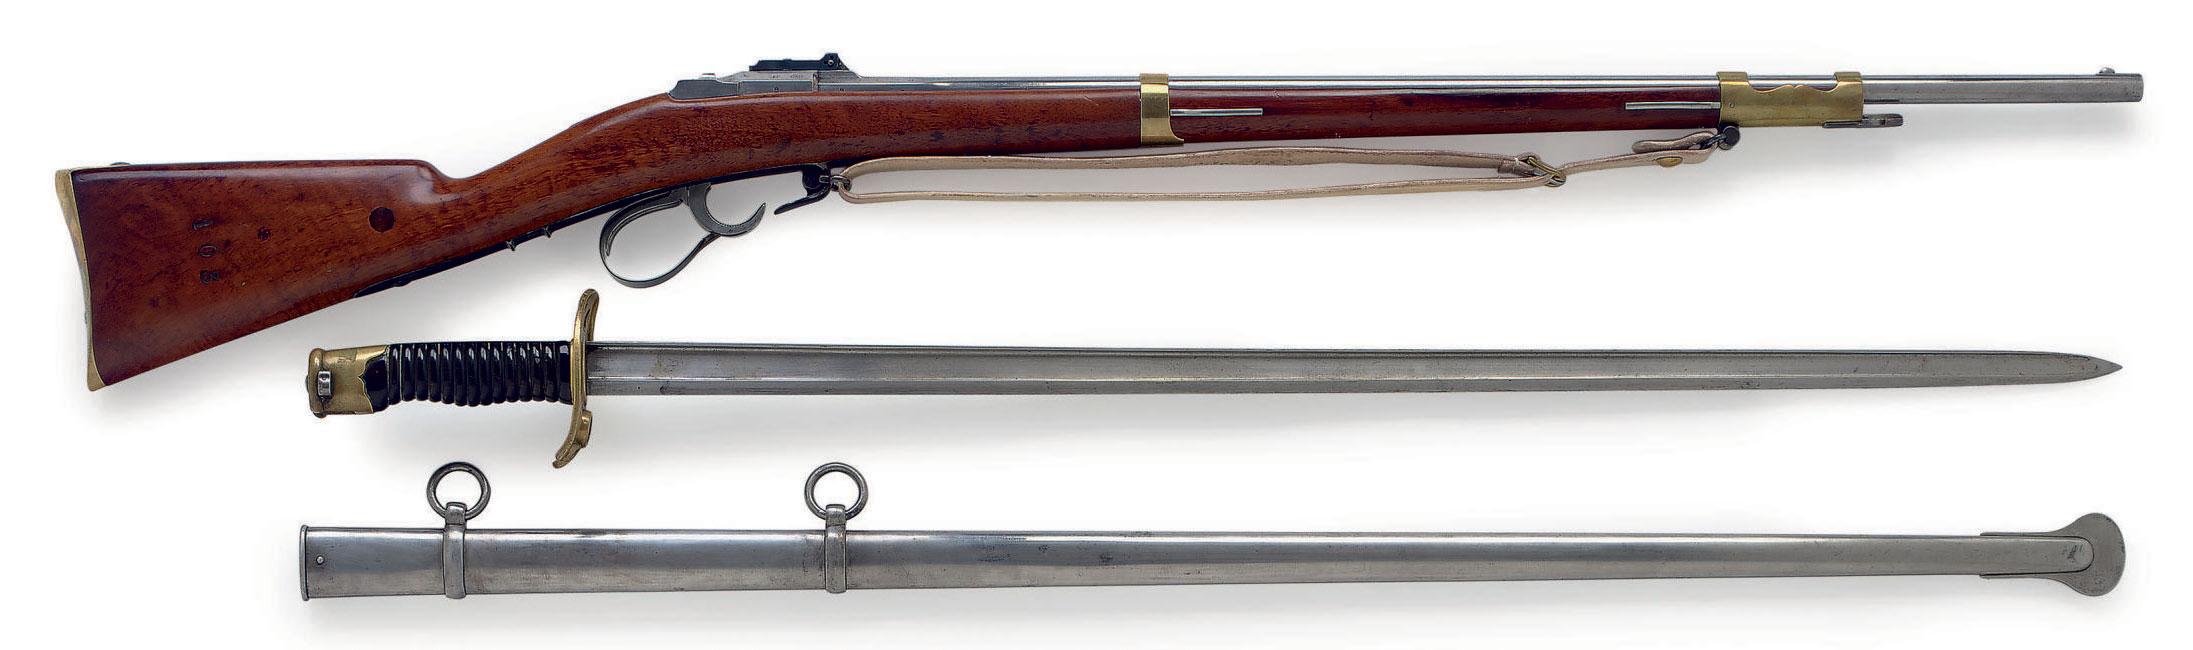 A RARE FRENCH MODEL 1854 PINFIRE FUSIL LANCE DE CENT-GARDES WITH SCARCE SWORD-BAYONET